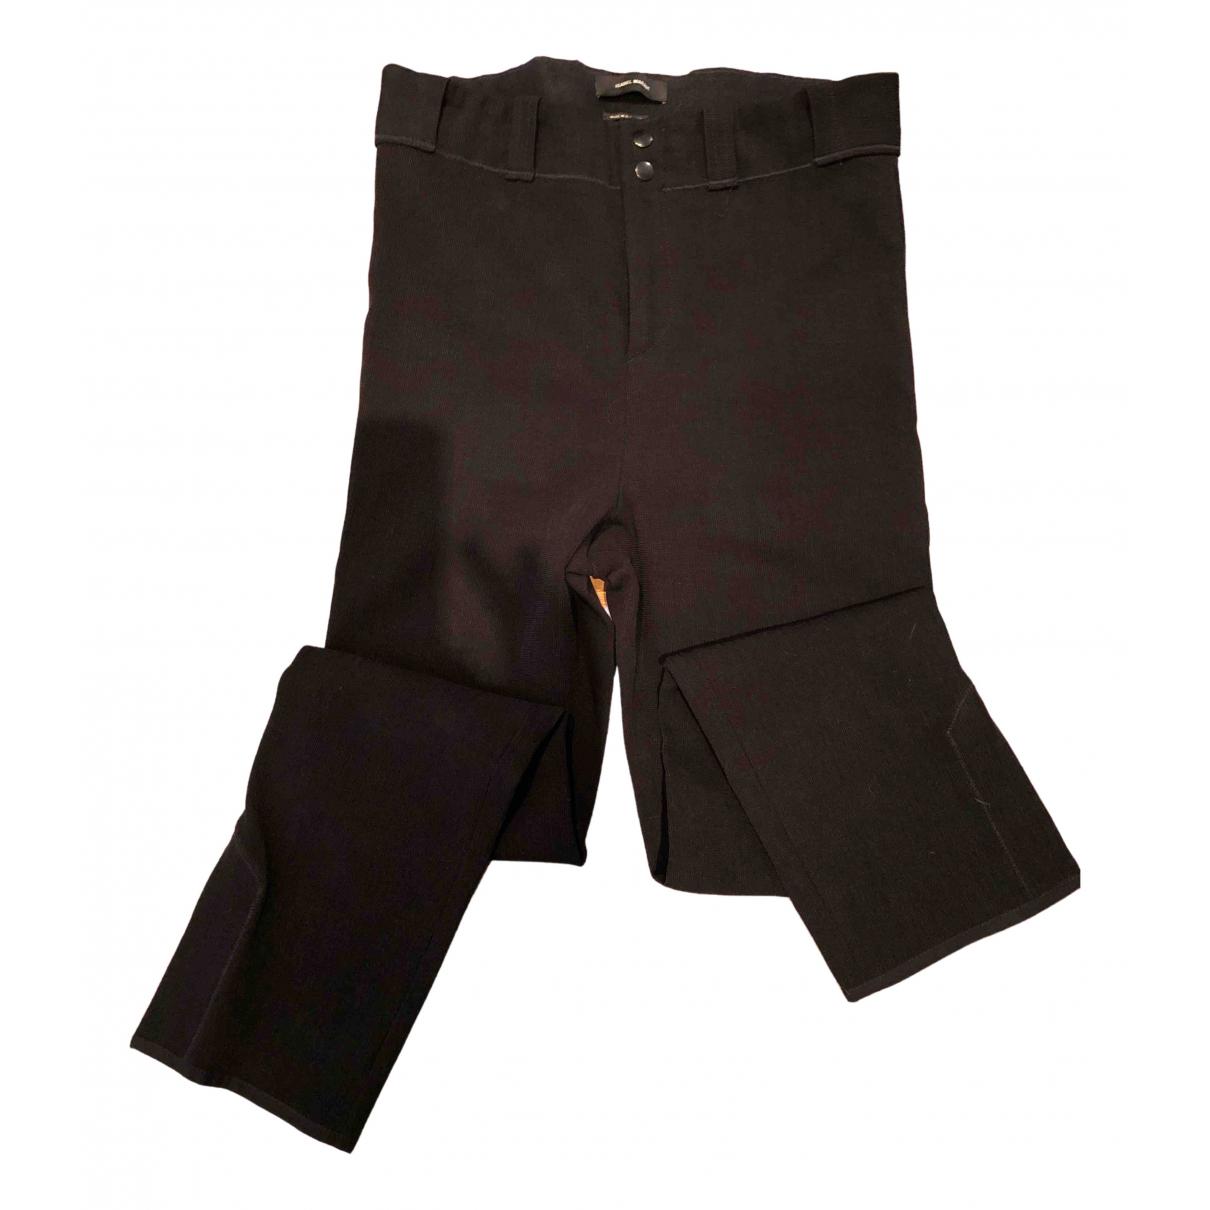 Isabel Marant N Black Spandex Trousers for Women M International